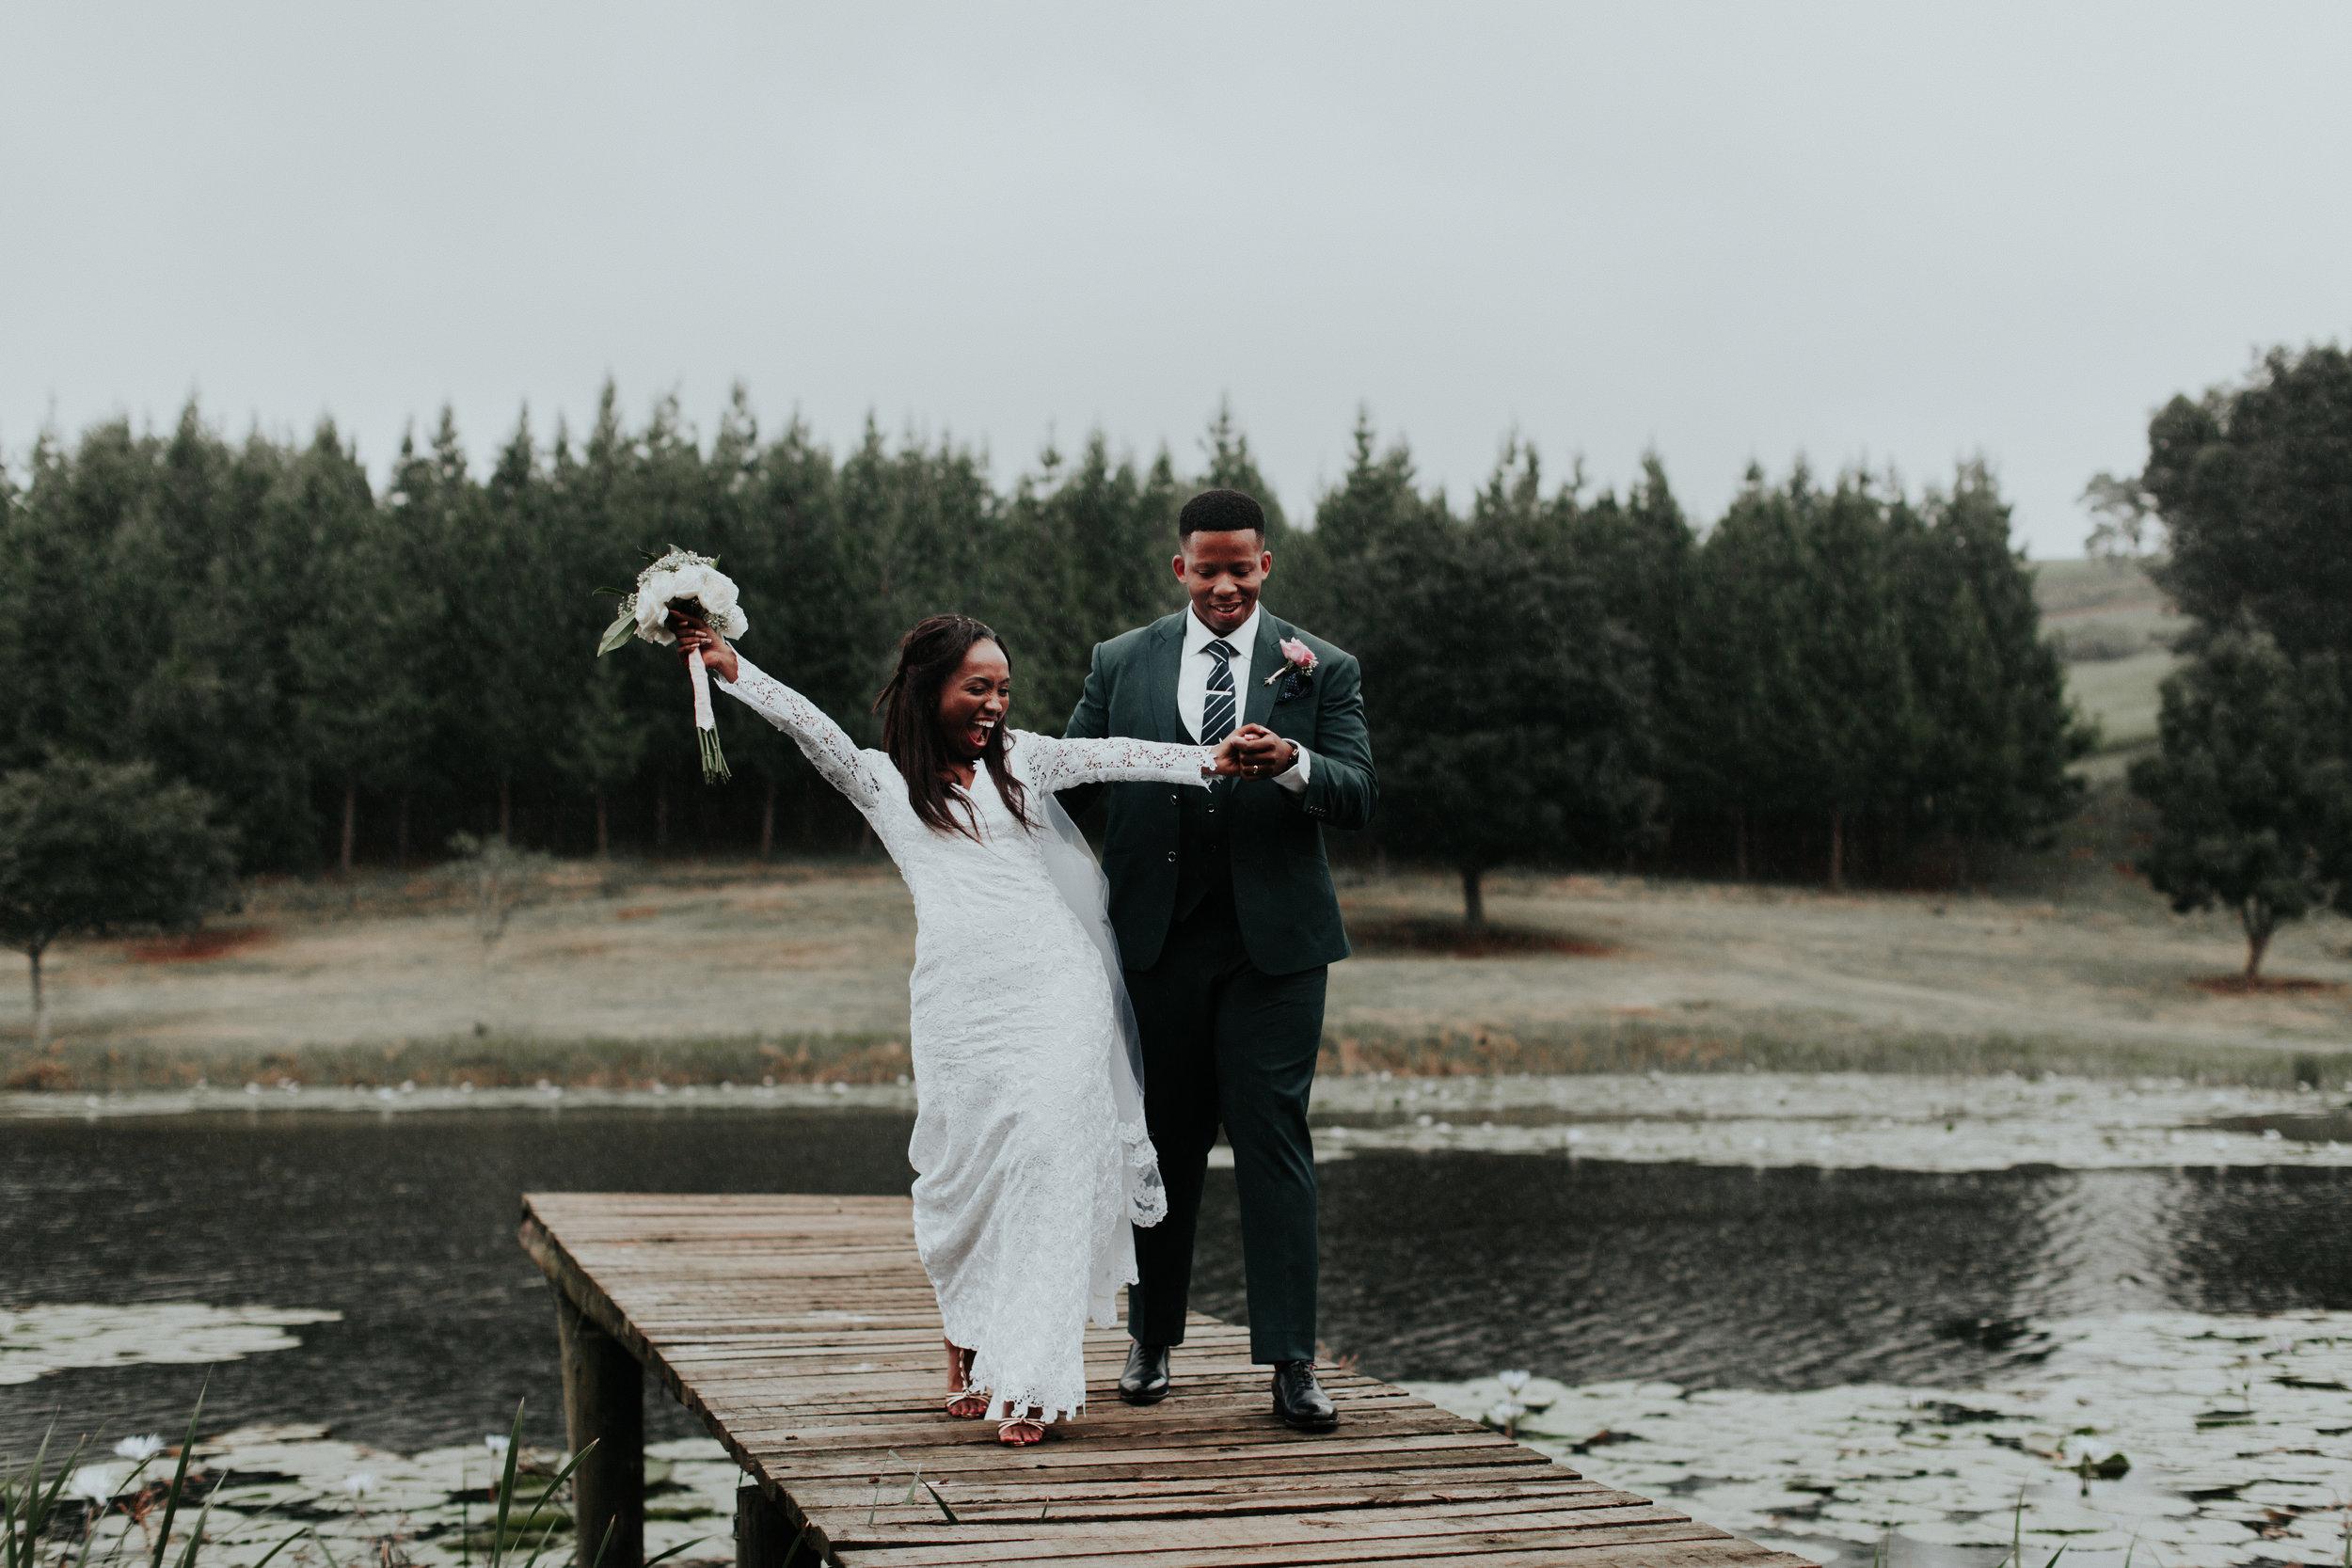 Kristi Smith Photography_Hloni&Nonto_ Wedding Photographer 22.jpg